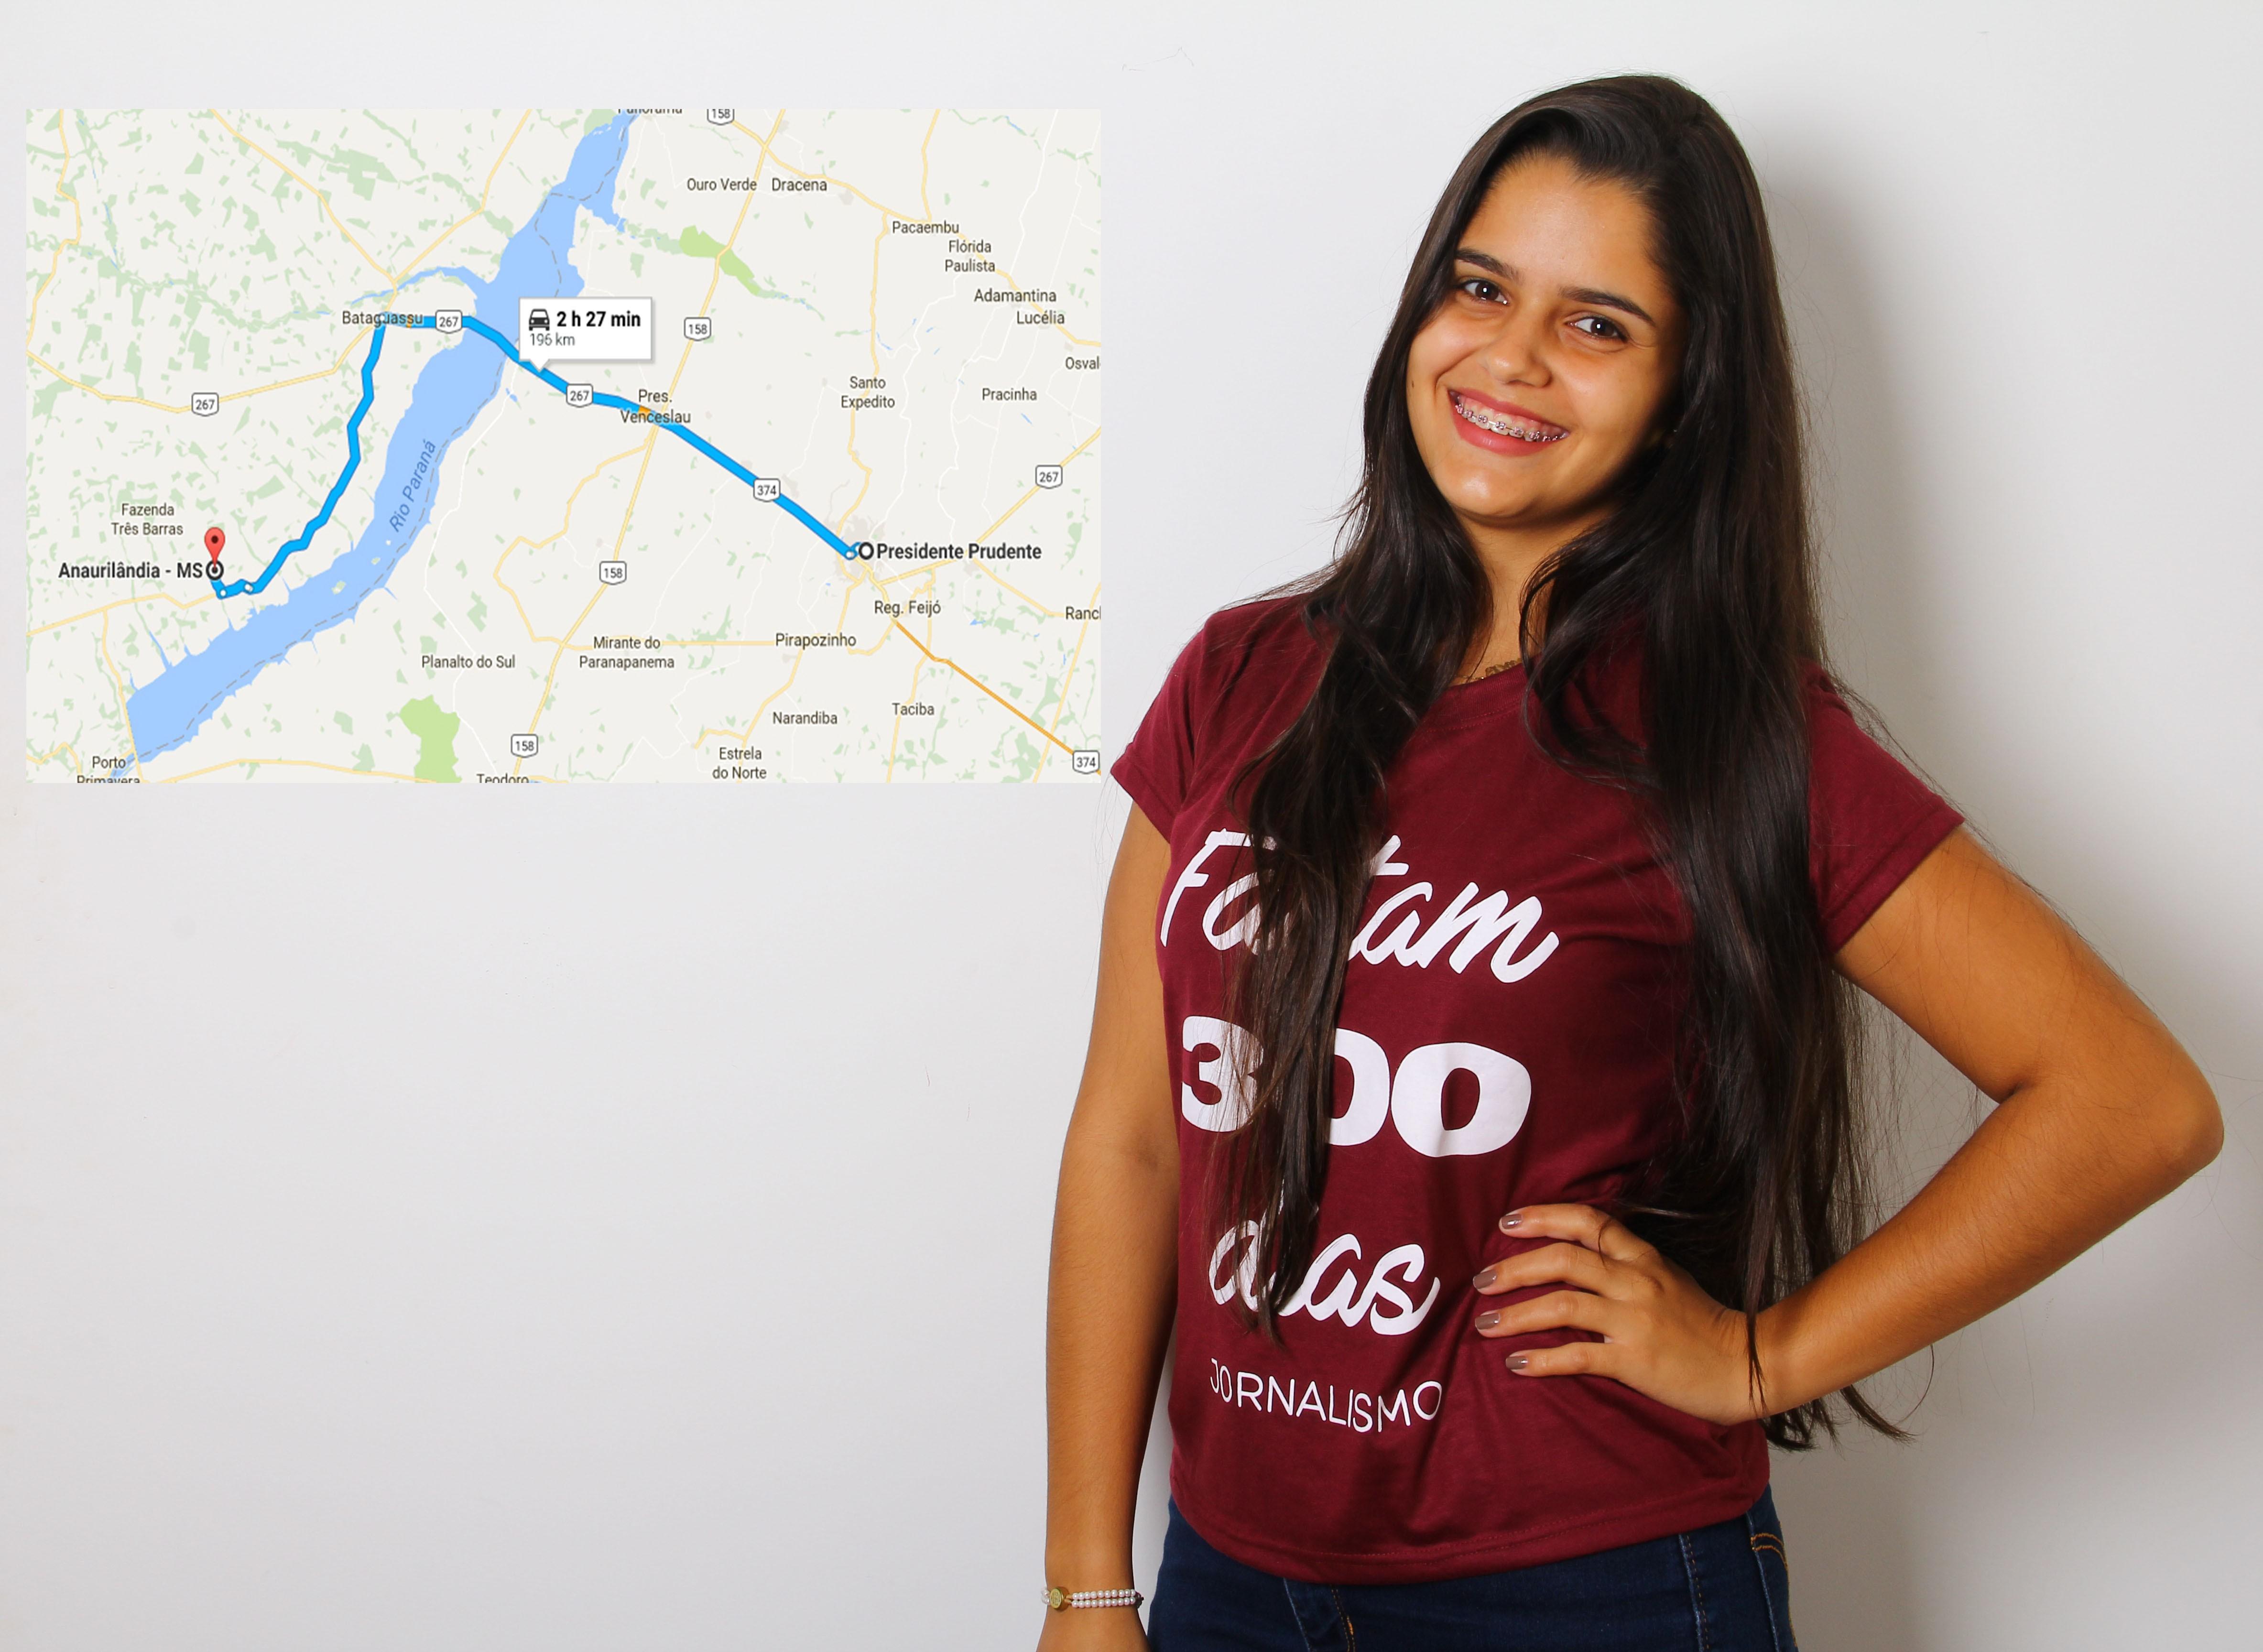 Na reta final do curso, facoppiana conta experiência longe da família